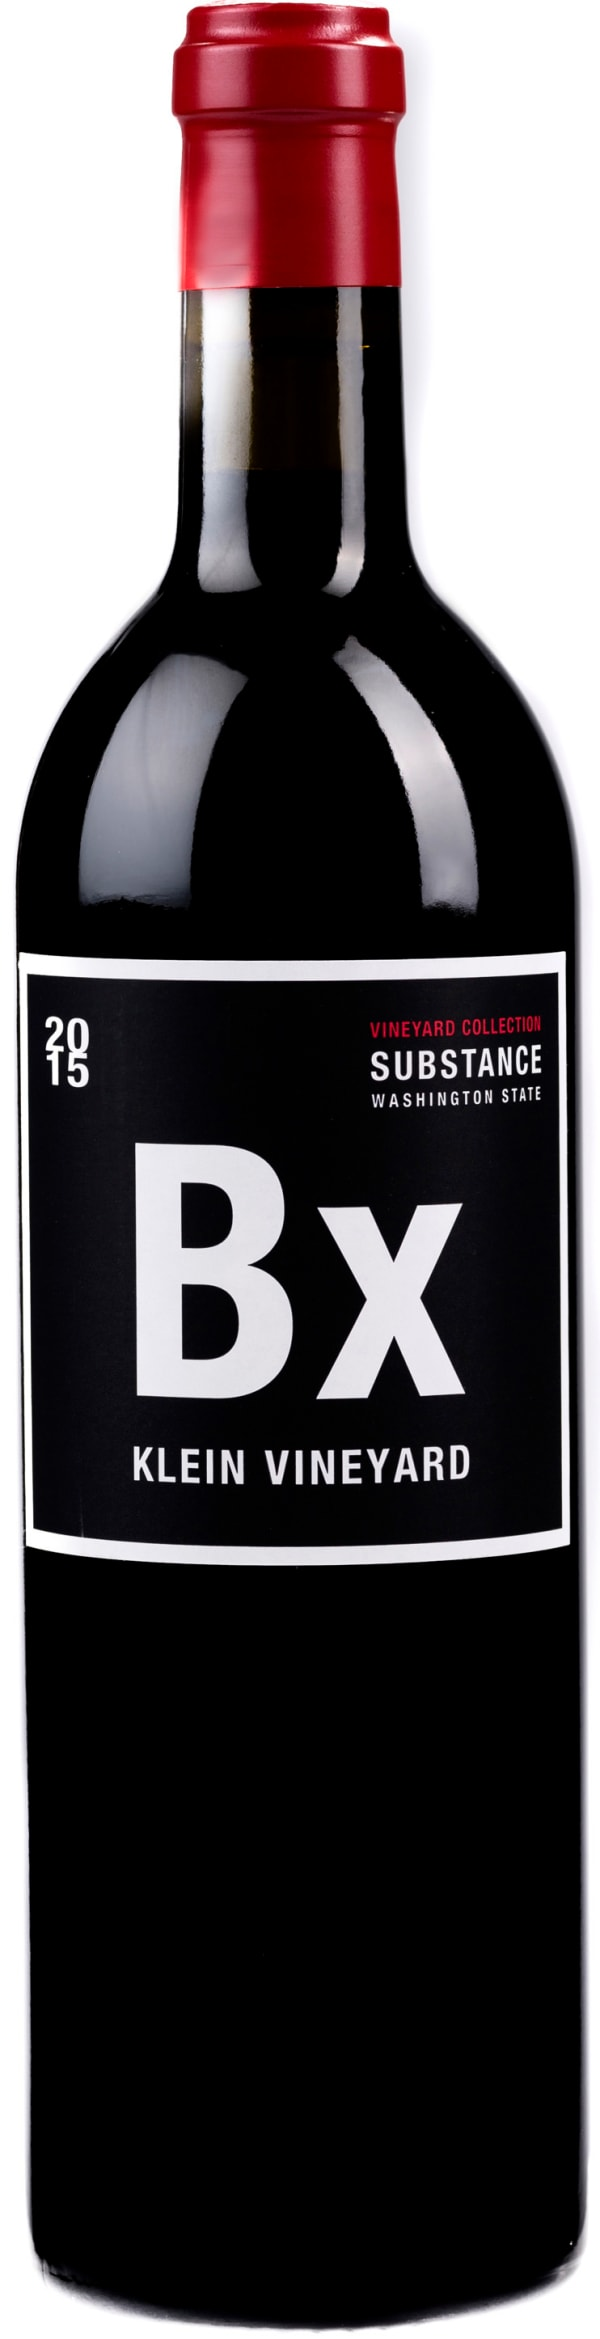 Wines of Substance Bx Klein Vineyard 2013